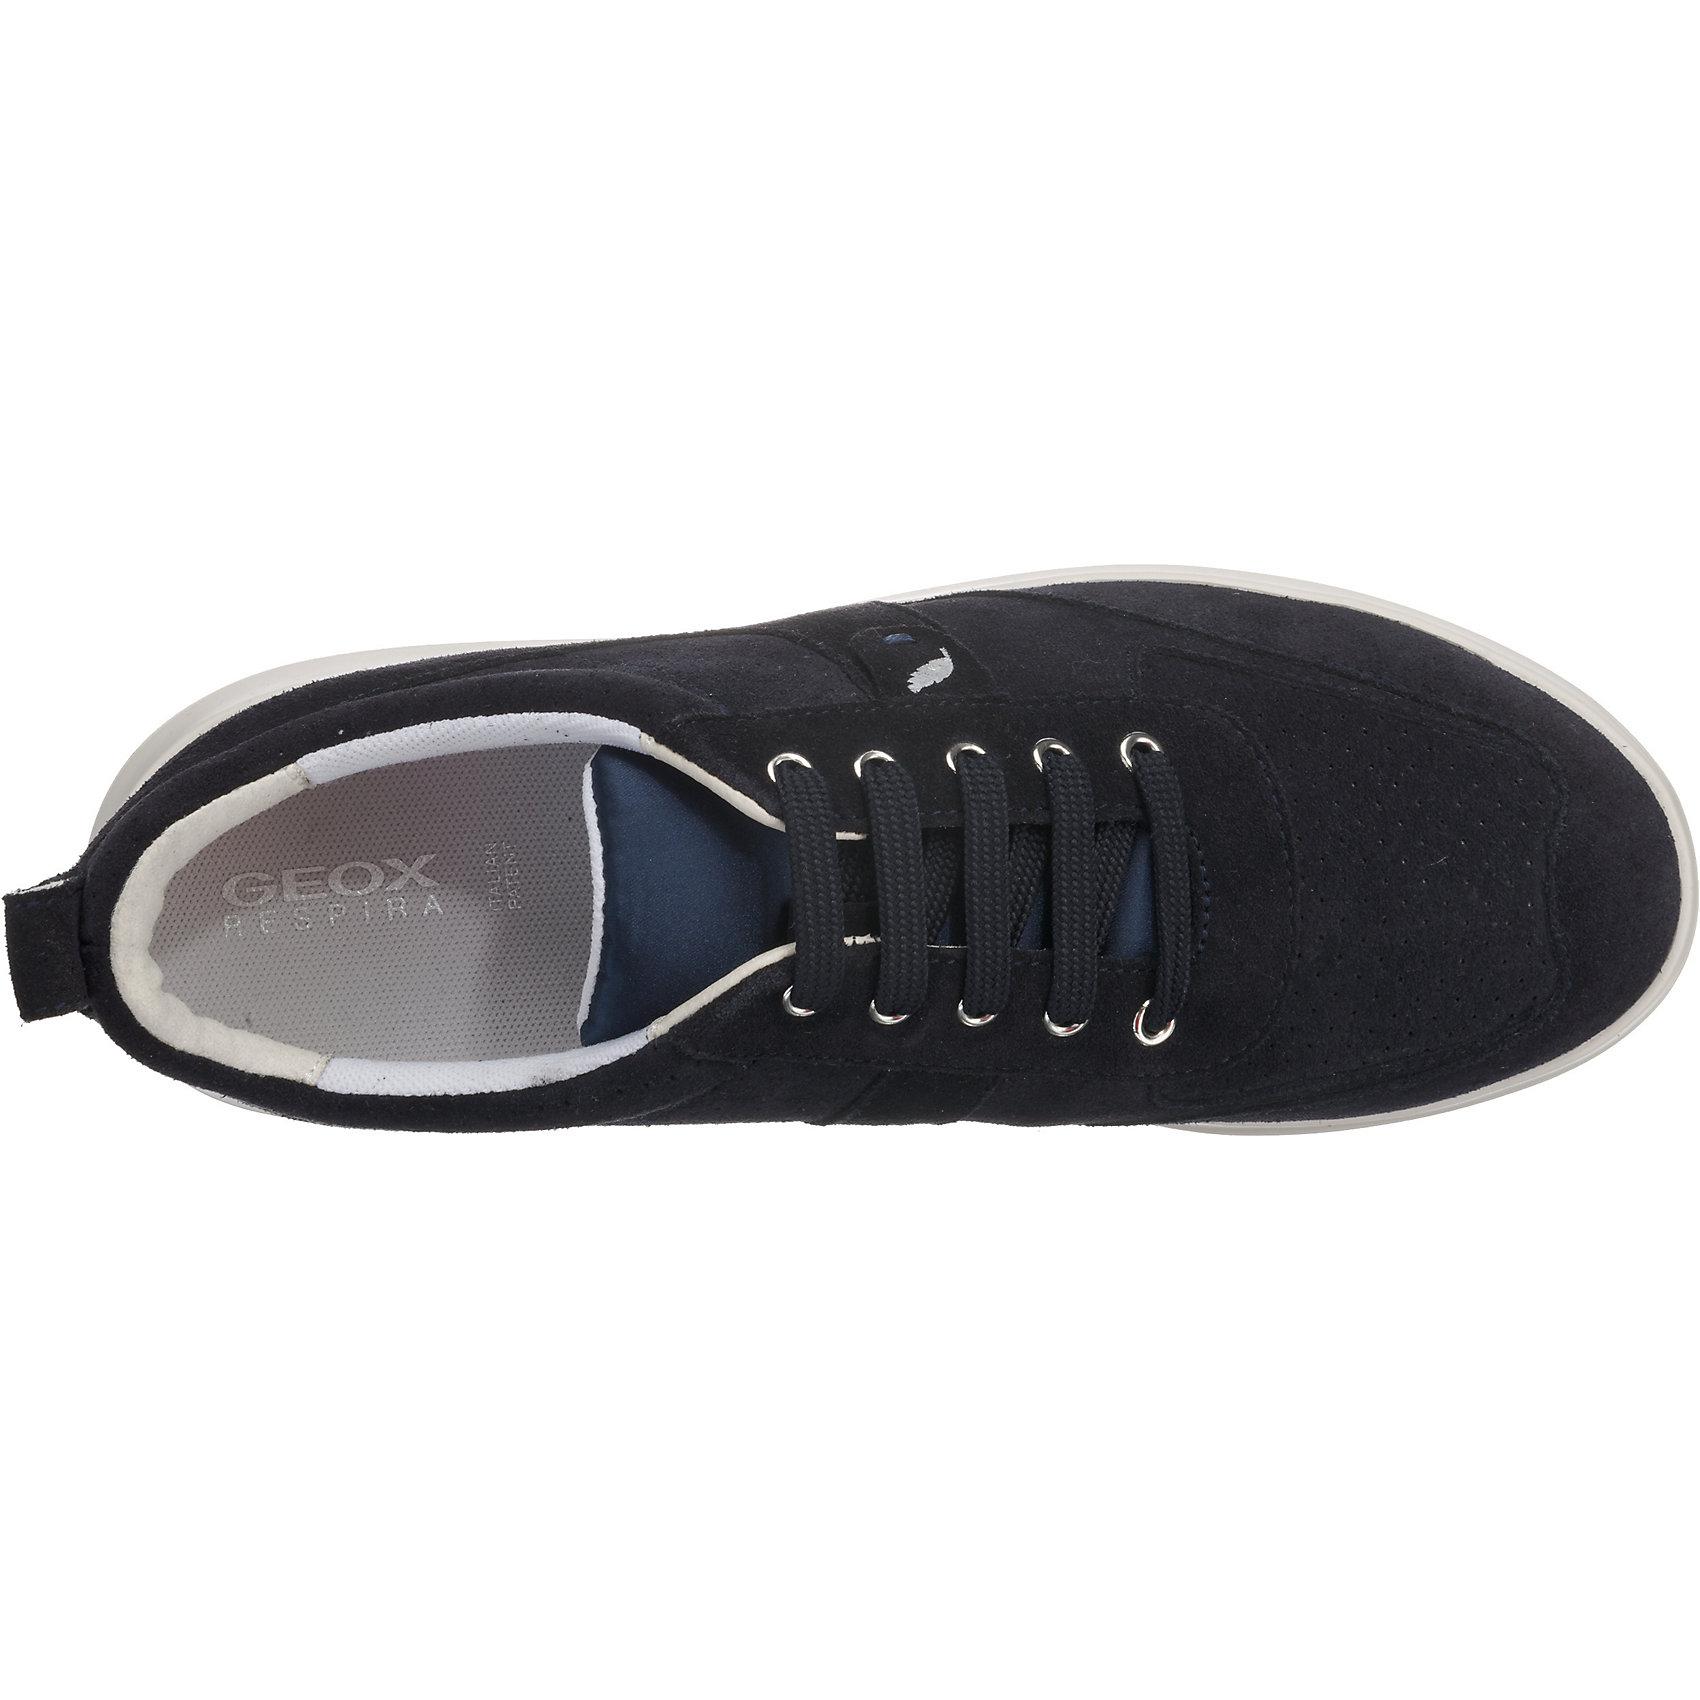 Neu GEOX D GOMESIB Sneakers Low 7918931 für Damen blau